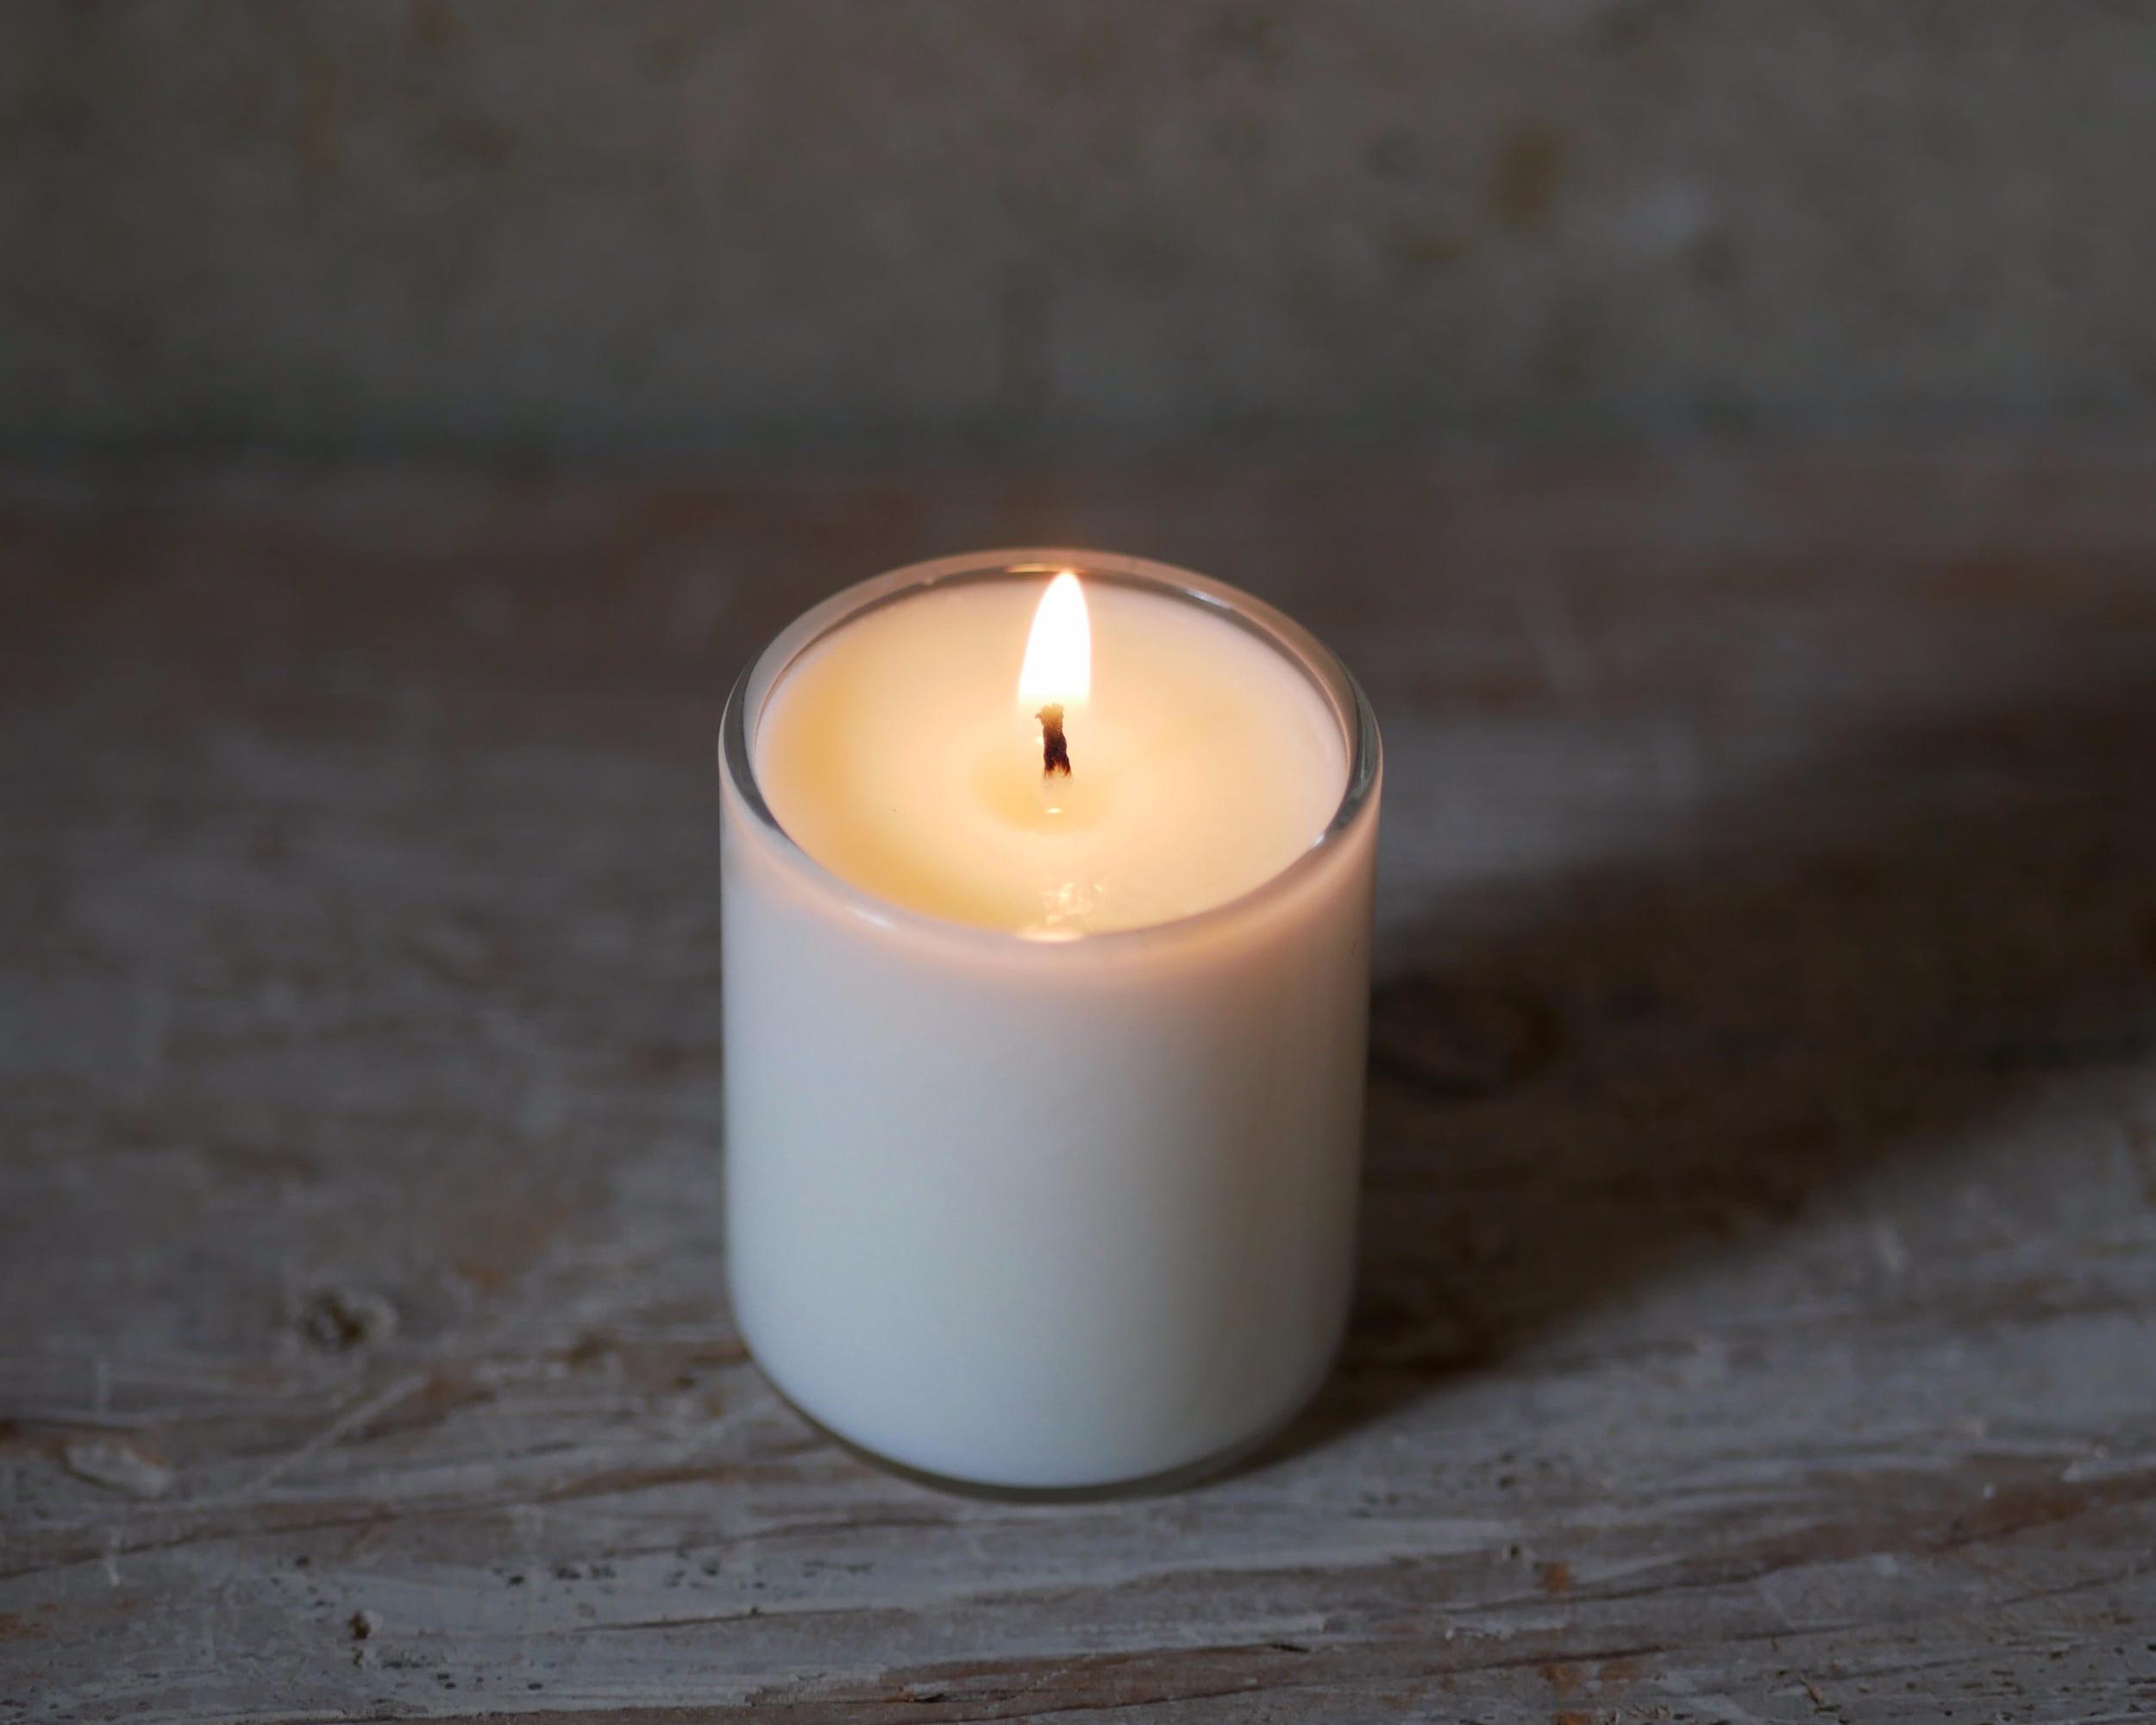 The warm glow of a lit E+A votive candle